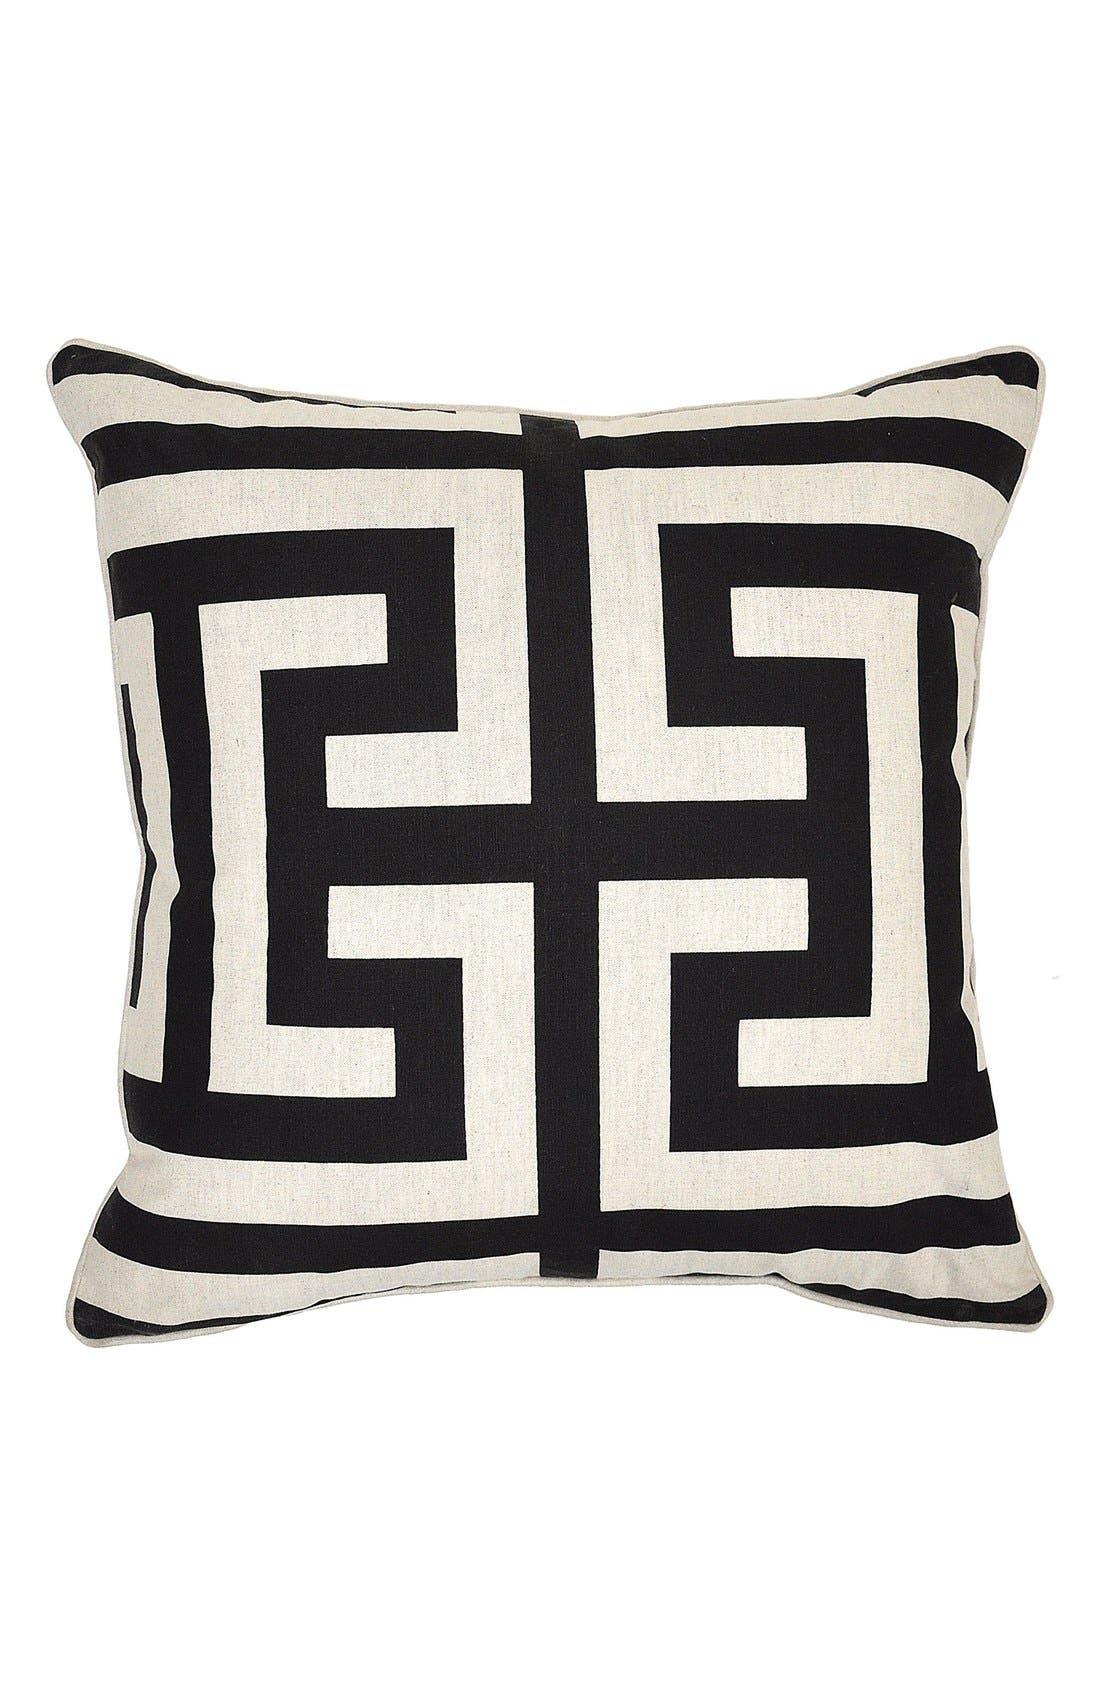 Alternate Image 1 Selected - Villa Home Collection 'Estate' Pillow